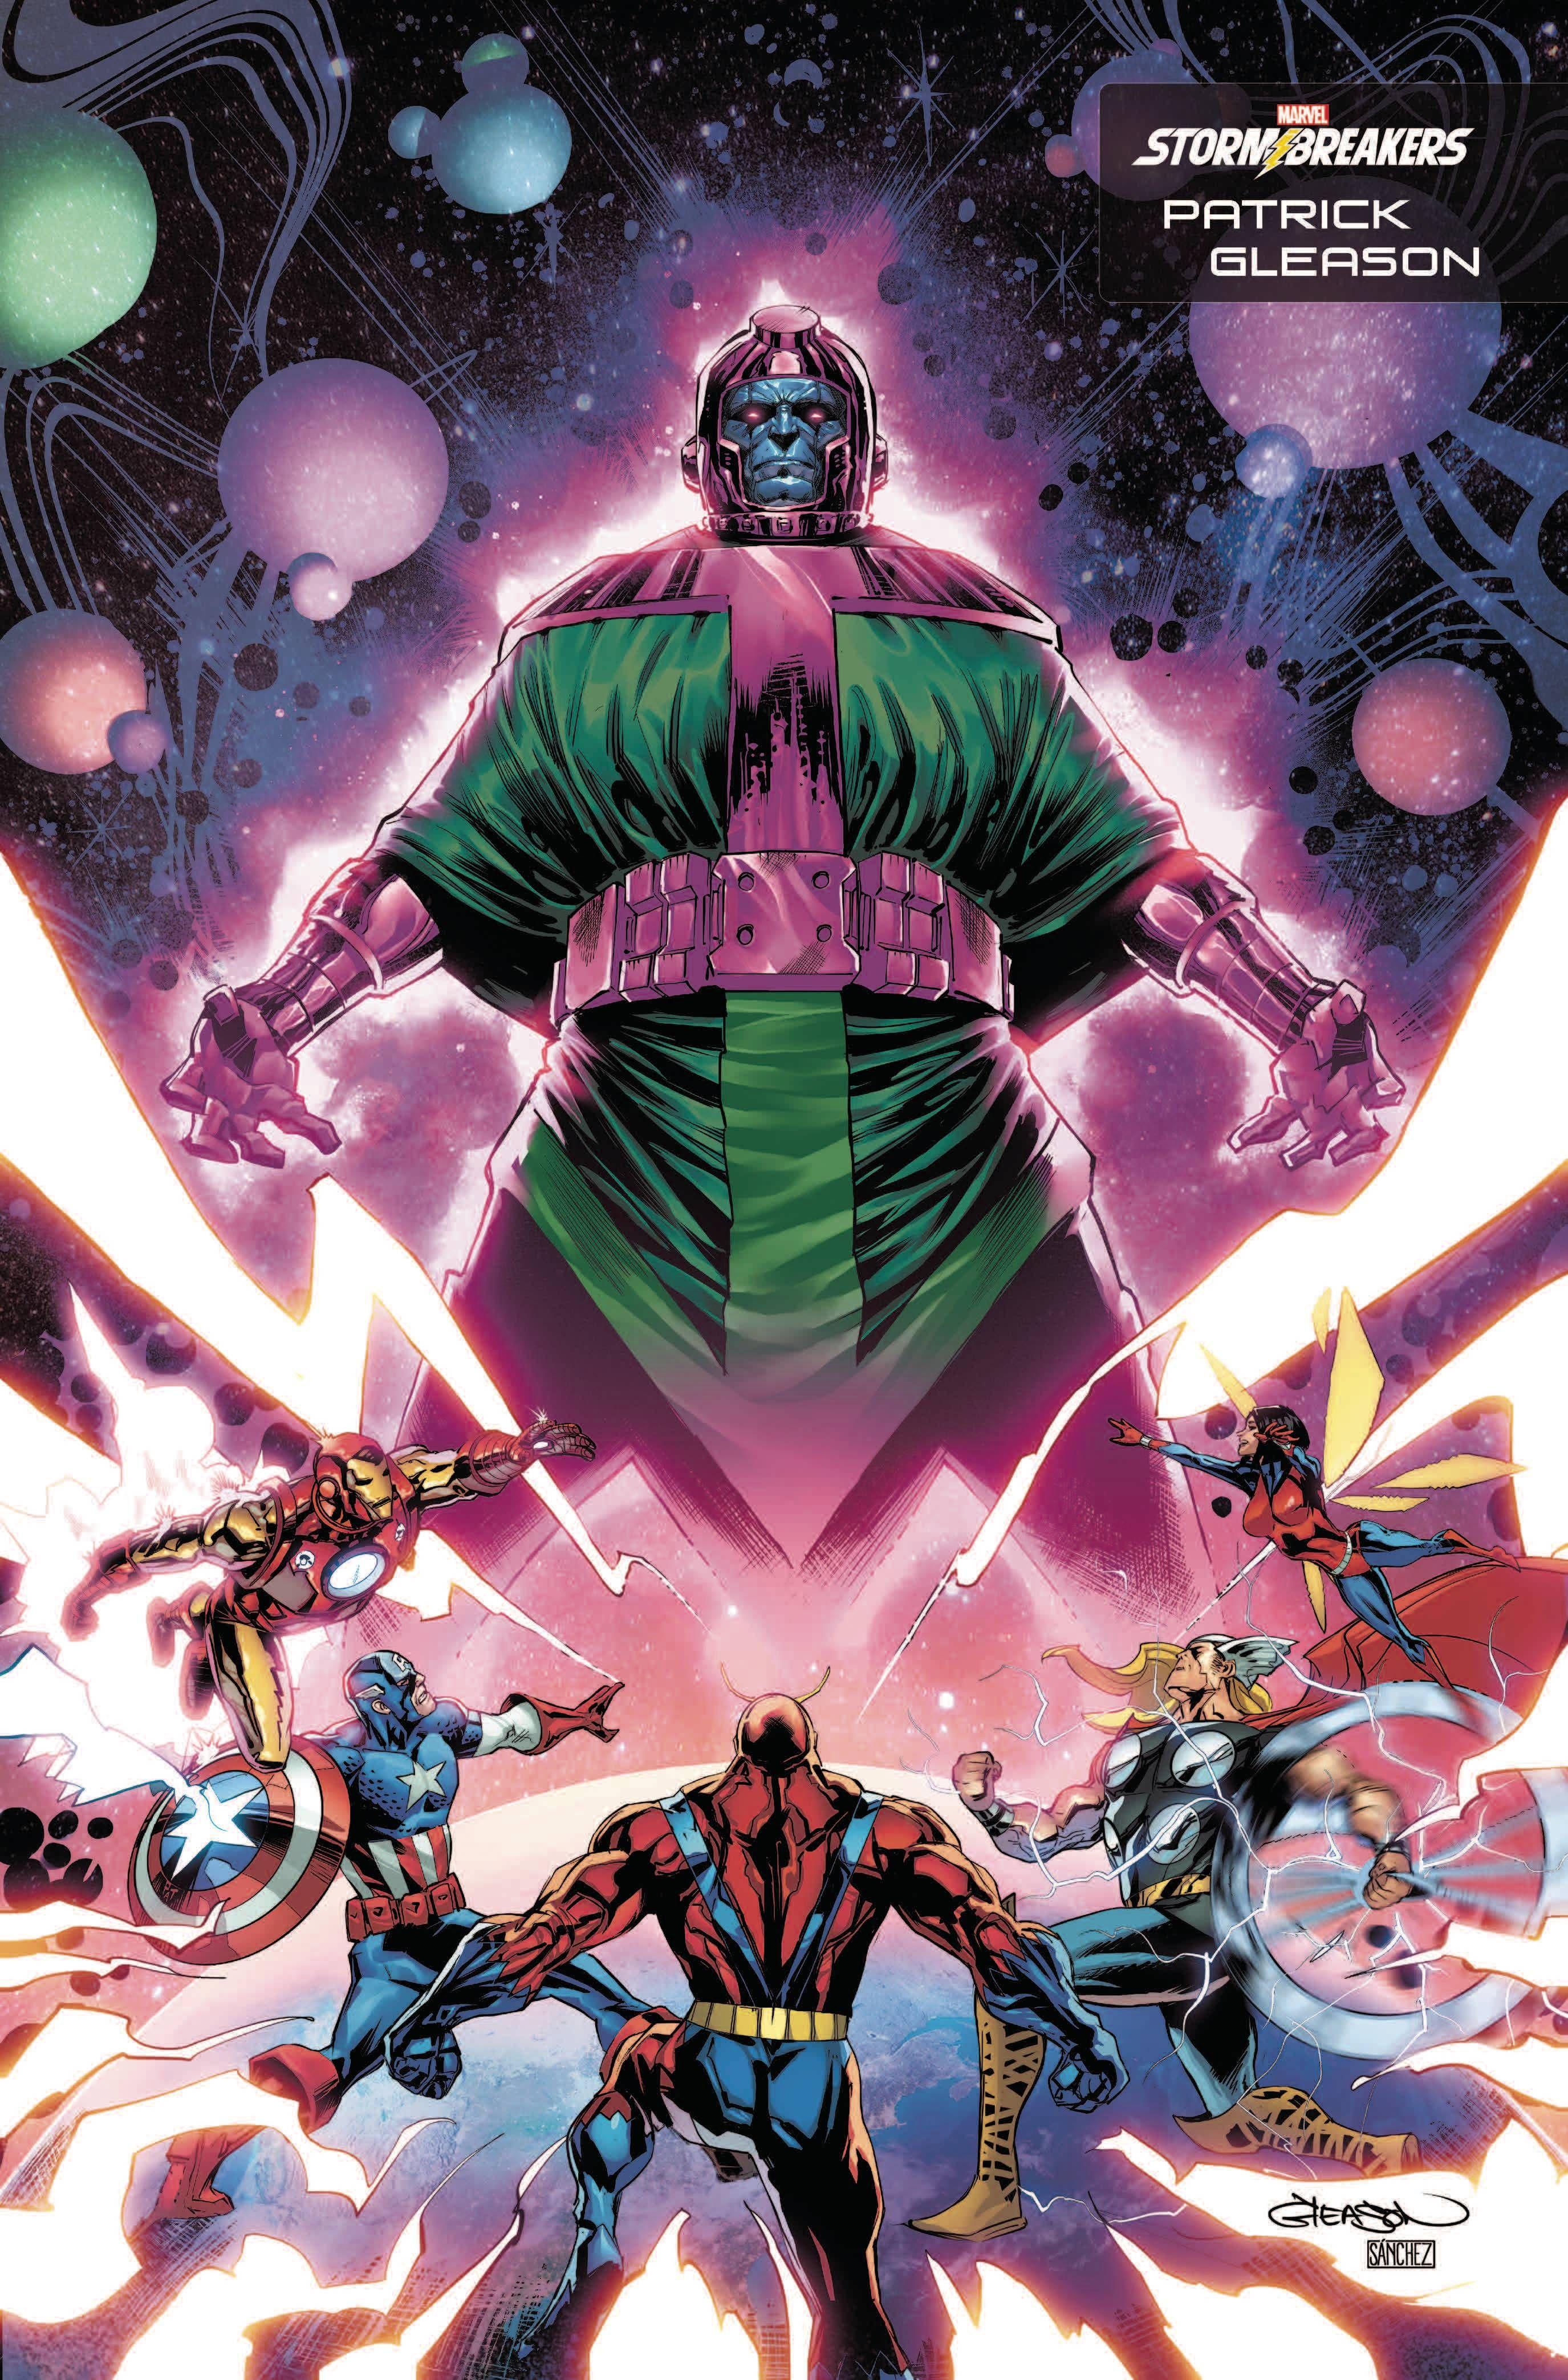 eyJidWNrZXQiOiJnb2NvbGxlY3QuaW1hZ2VzLnB1YiIsImtleSI6ImViMDk3ZDRlLWE1MjItNGM5Zi1hYzVjLWIyNWU4YmZjNWZhYi5qcGciLCJlZGl0cyI6W119 ComicList: Marvel Comics New Releases for 08/18/2021